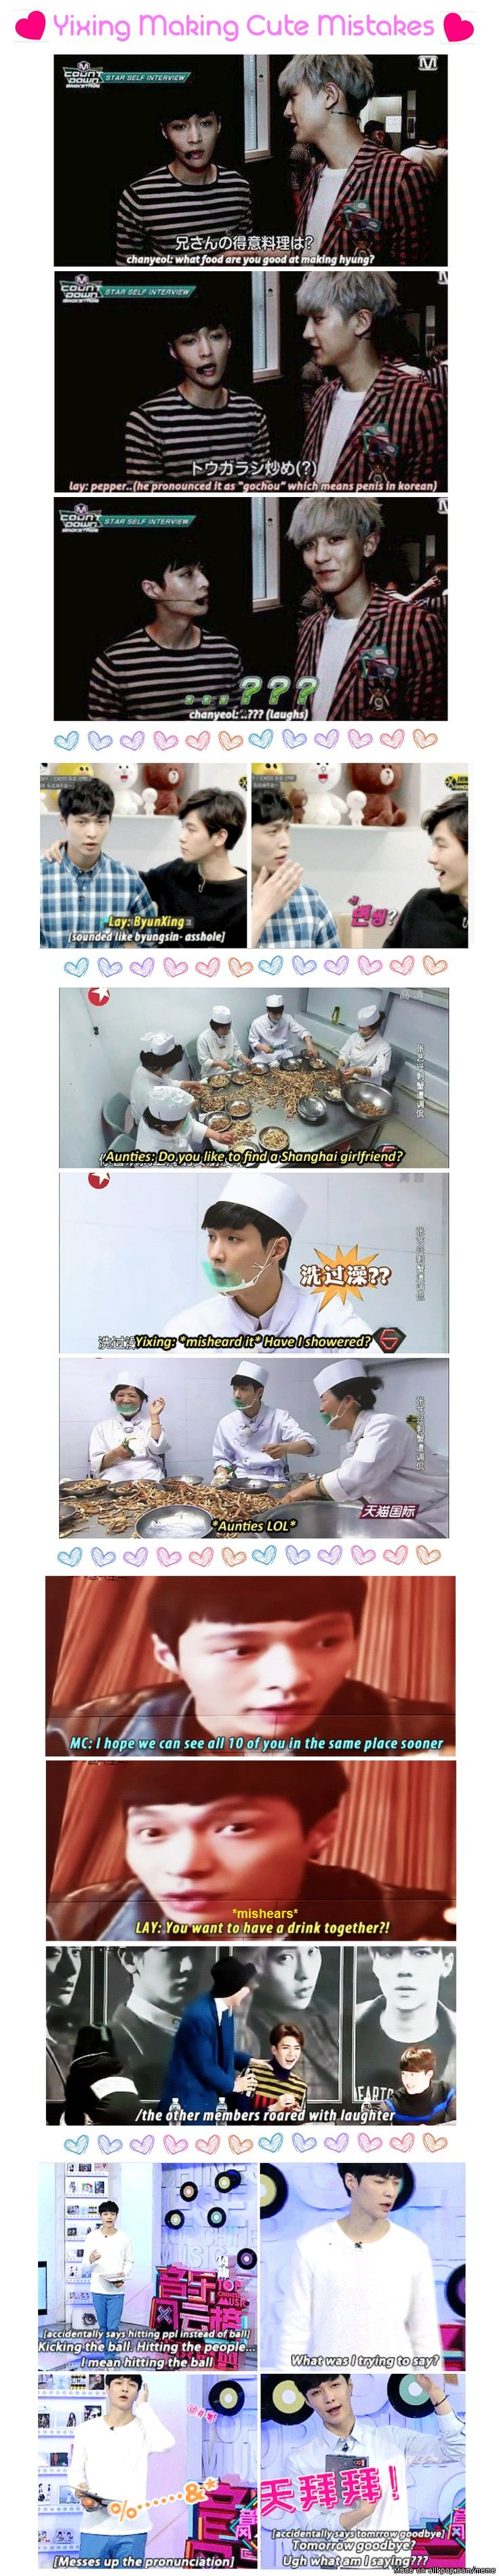 Zhang Yixing is too precious | allkpop Meme Center